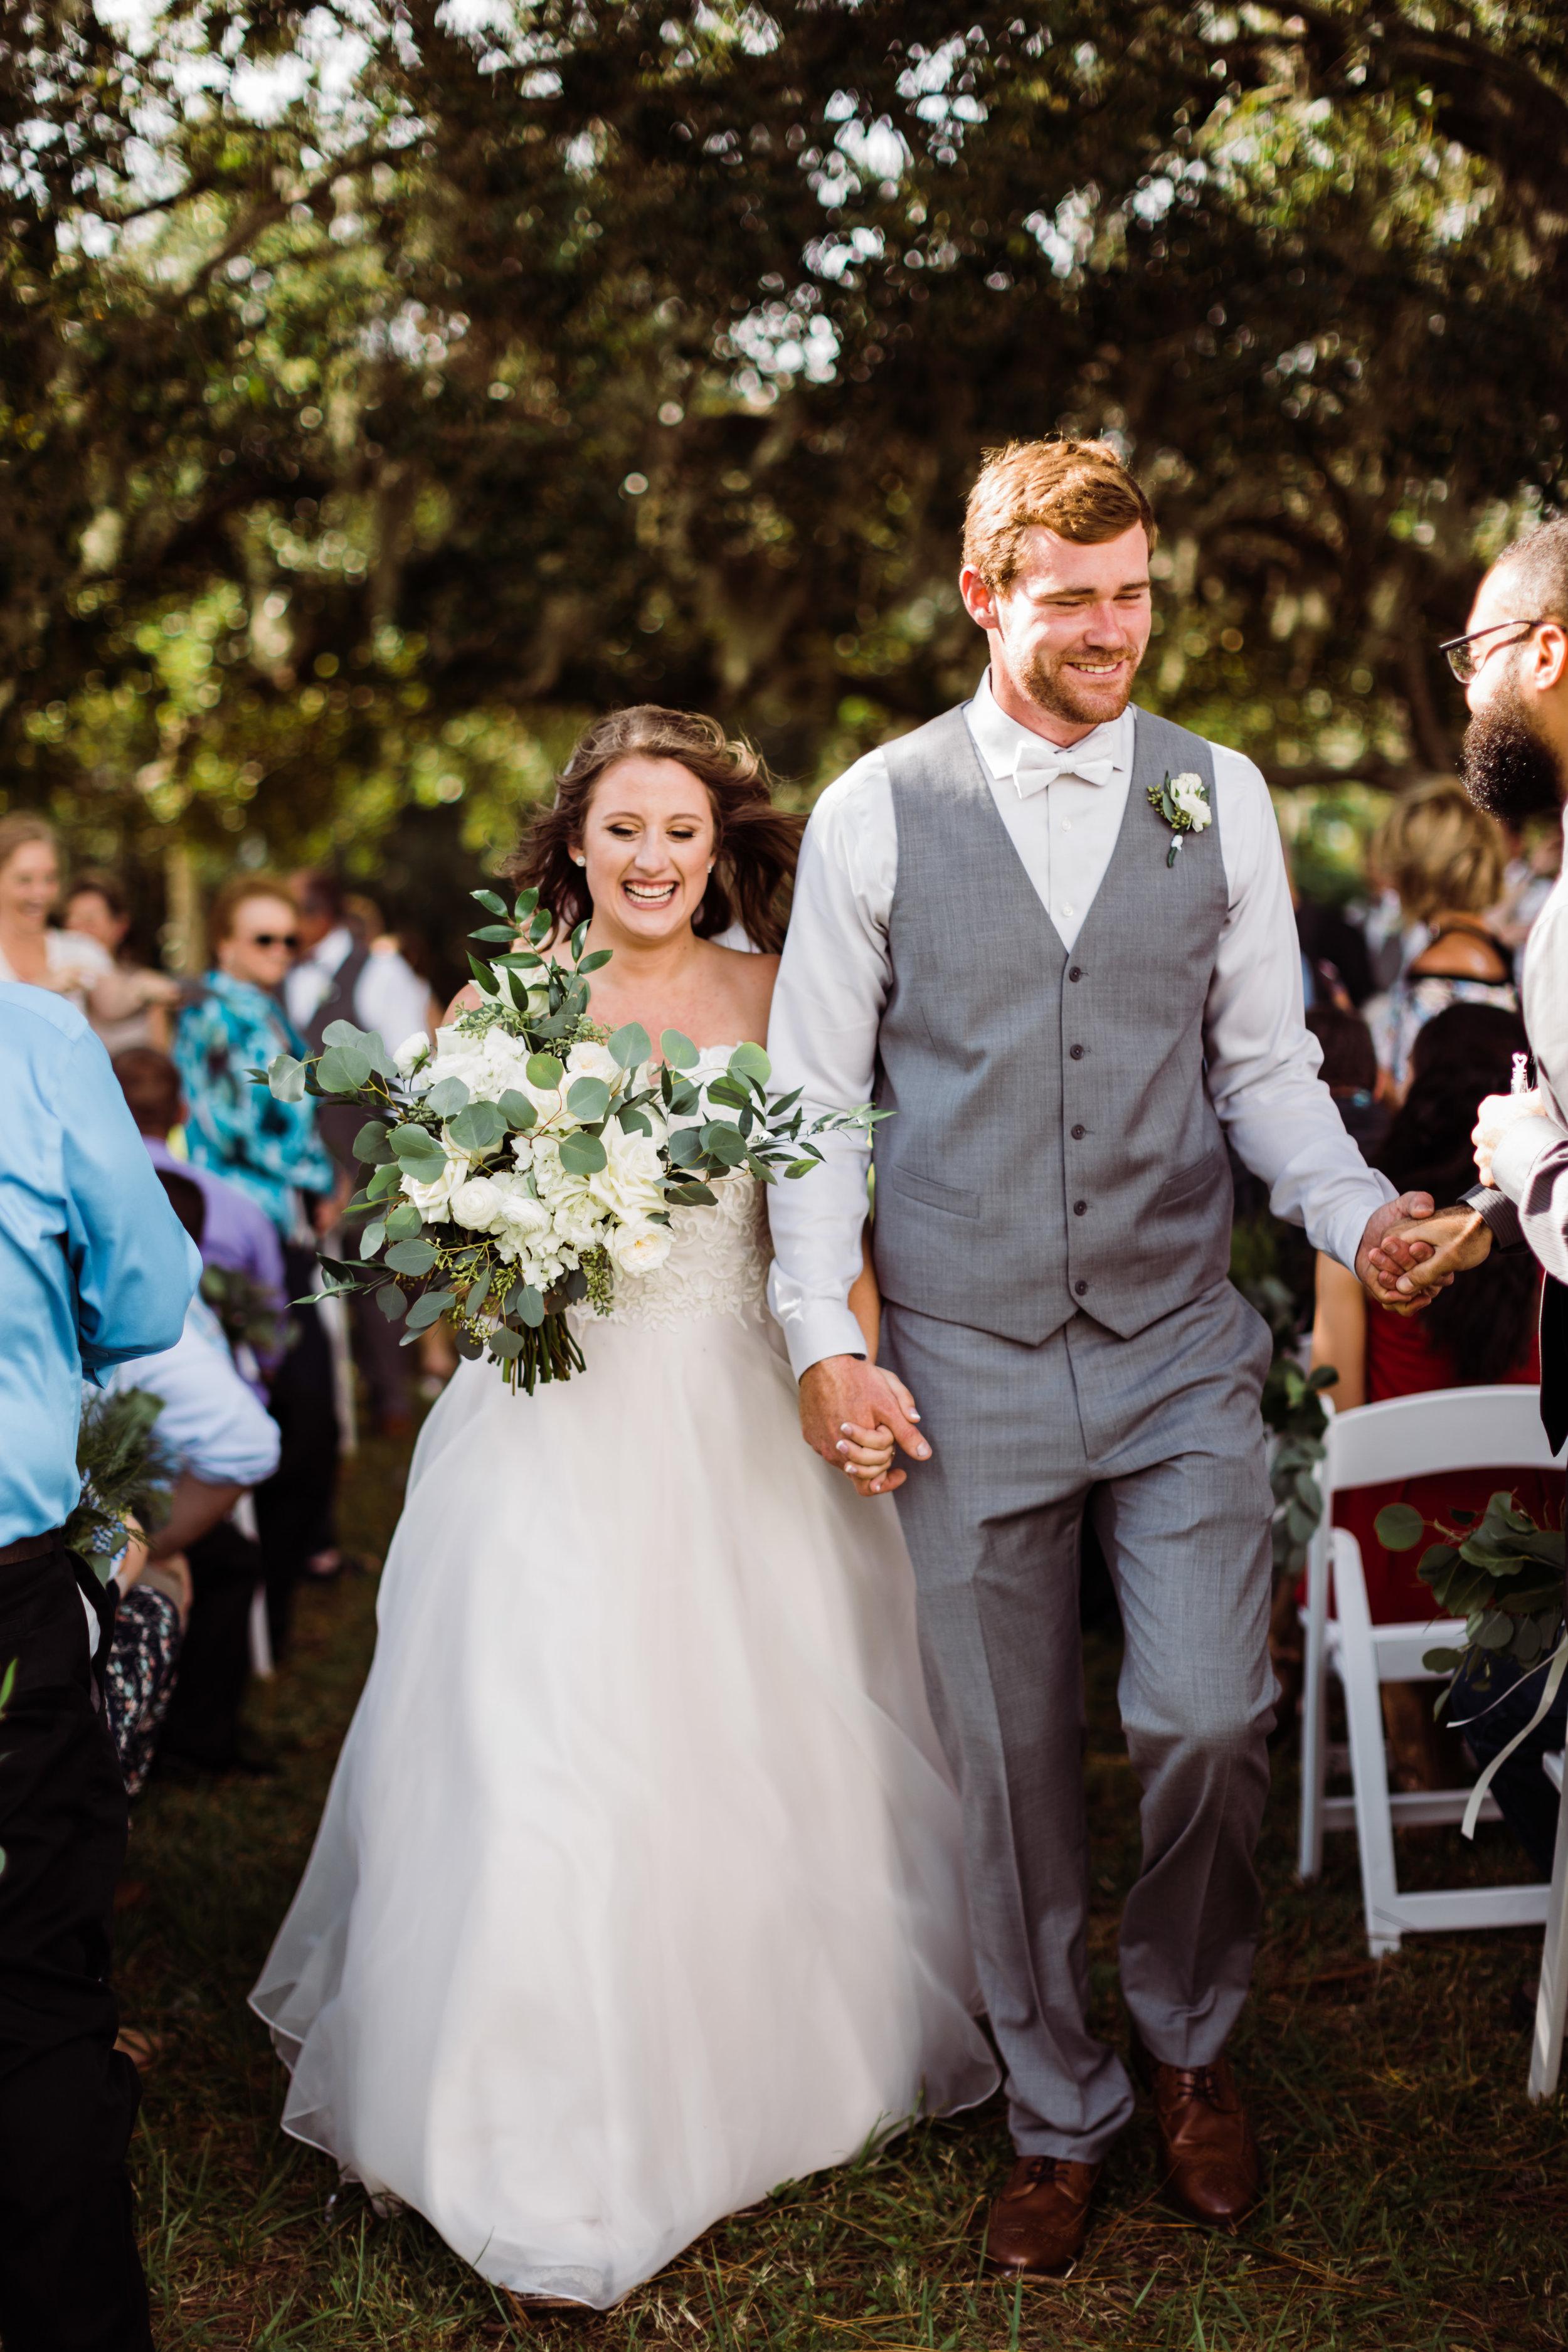 2017.10.14 Samantha and Matthew Crabtree Sarasota Wedding (197 of 708).jpg